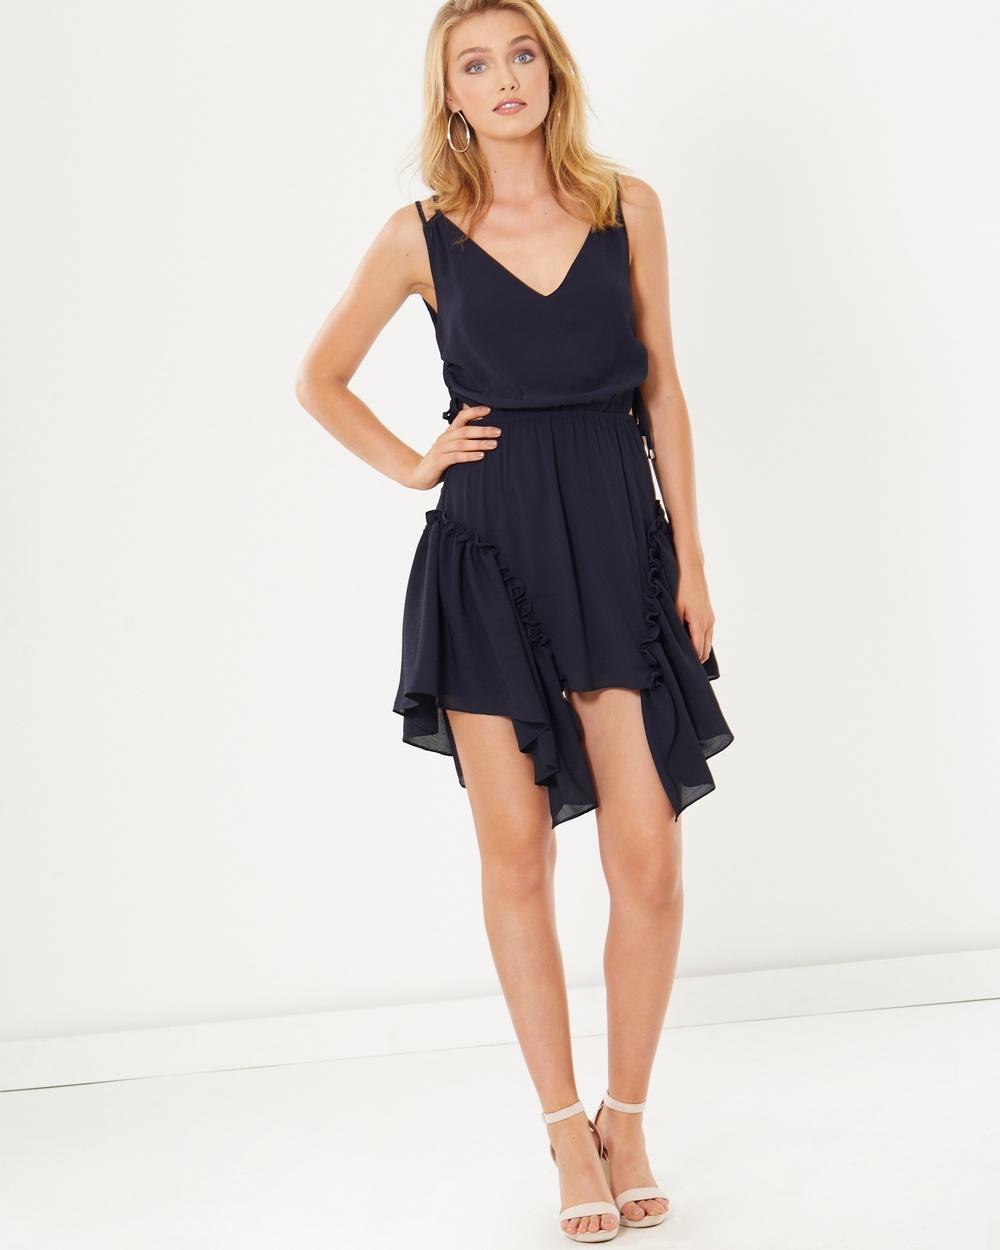 Tussah Dahlia Ruffle Mini Dress Dresses Navy Dahlia Ruffle Mini Dress